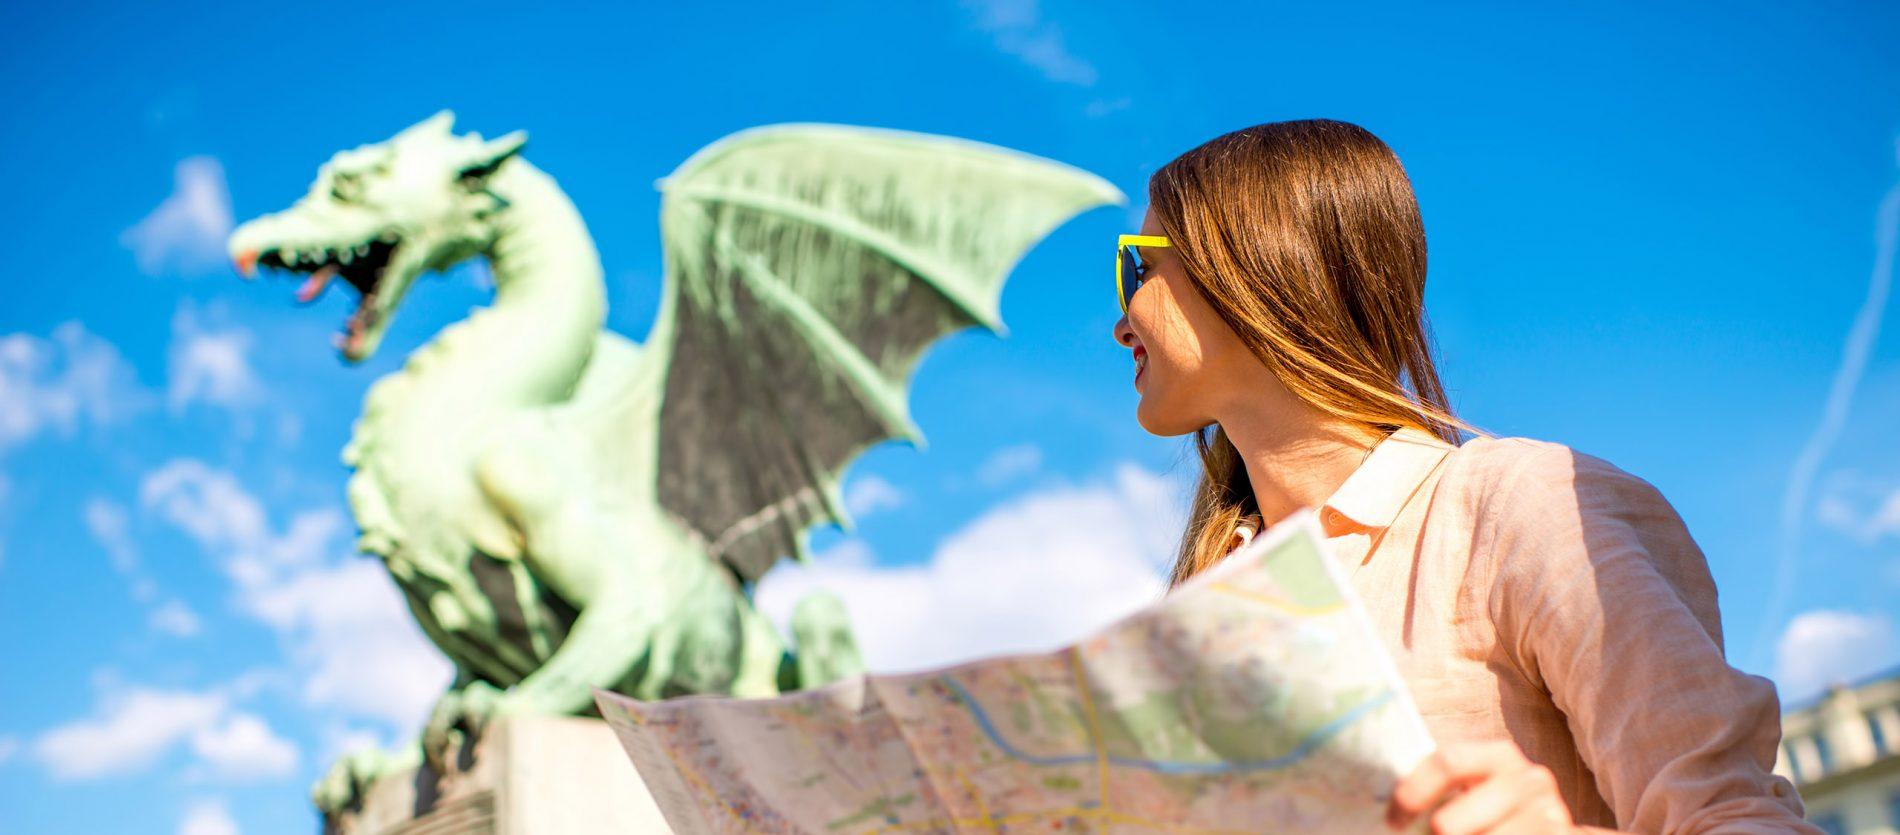 Go on a thrilling adventure with Ljubljana's dragon!